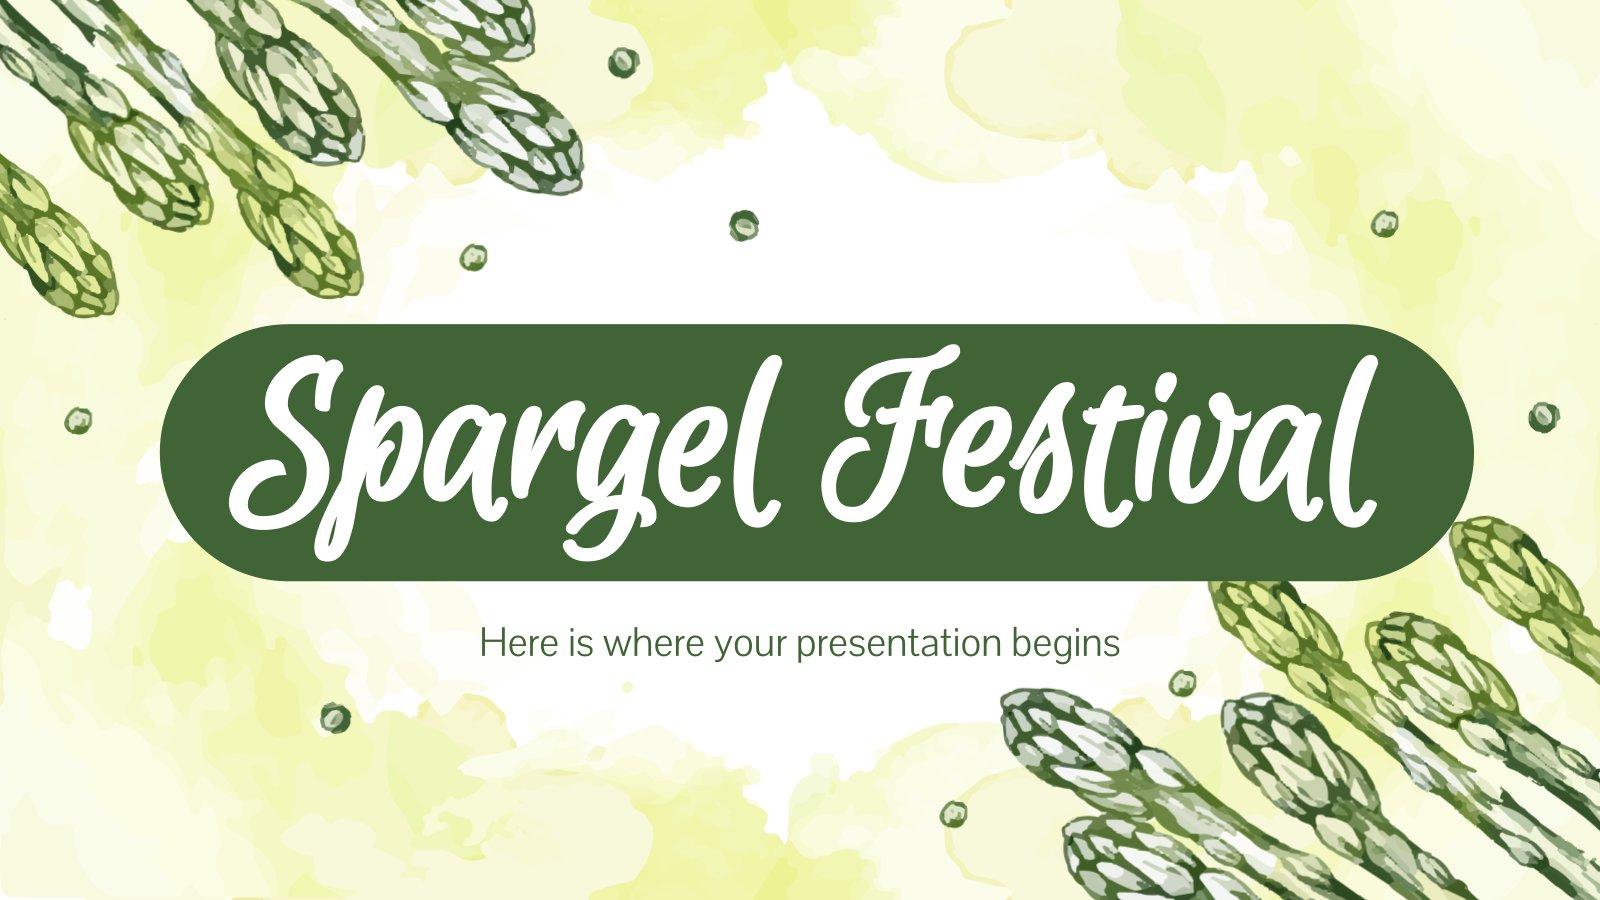 Spargel Festival presentation template